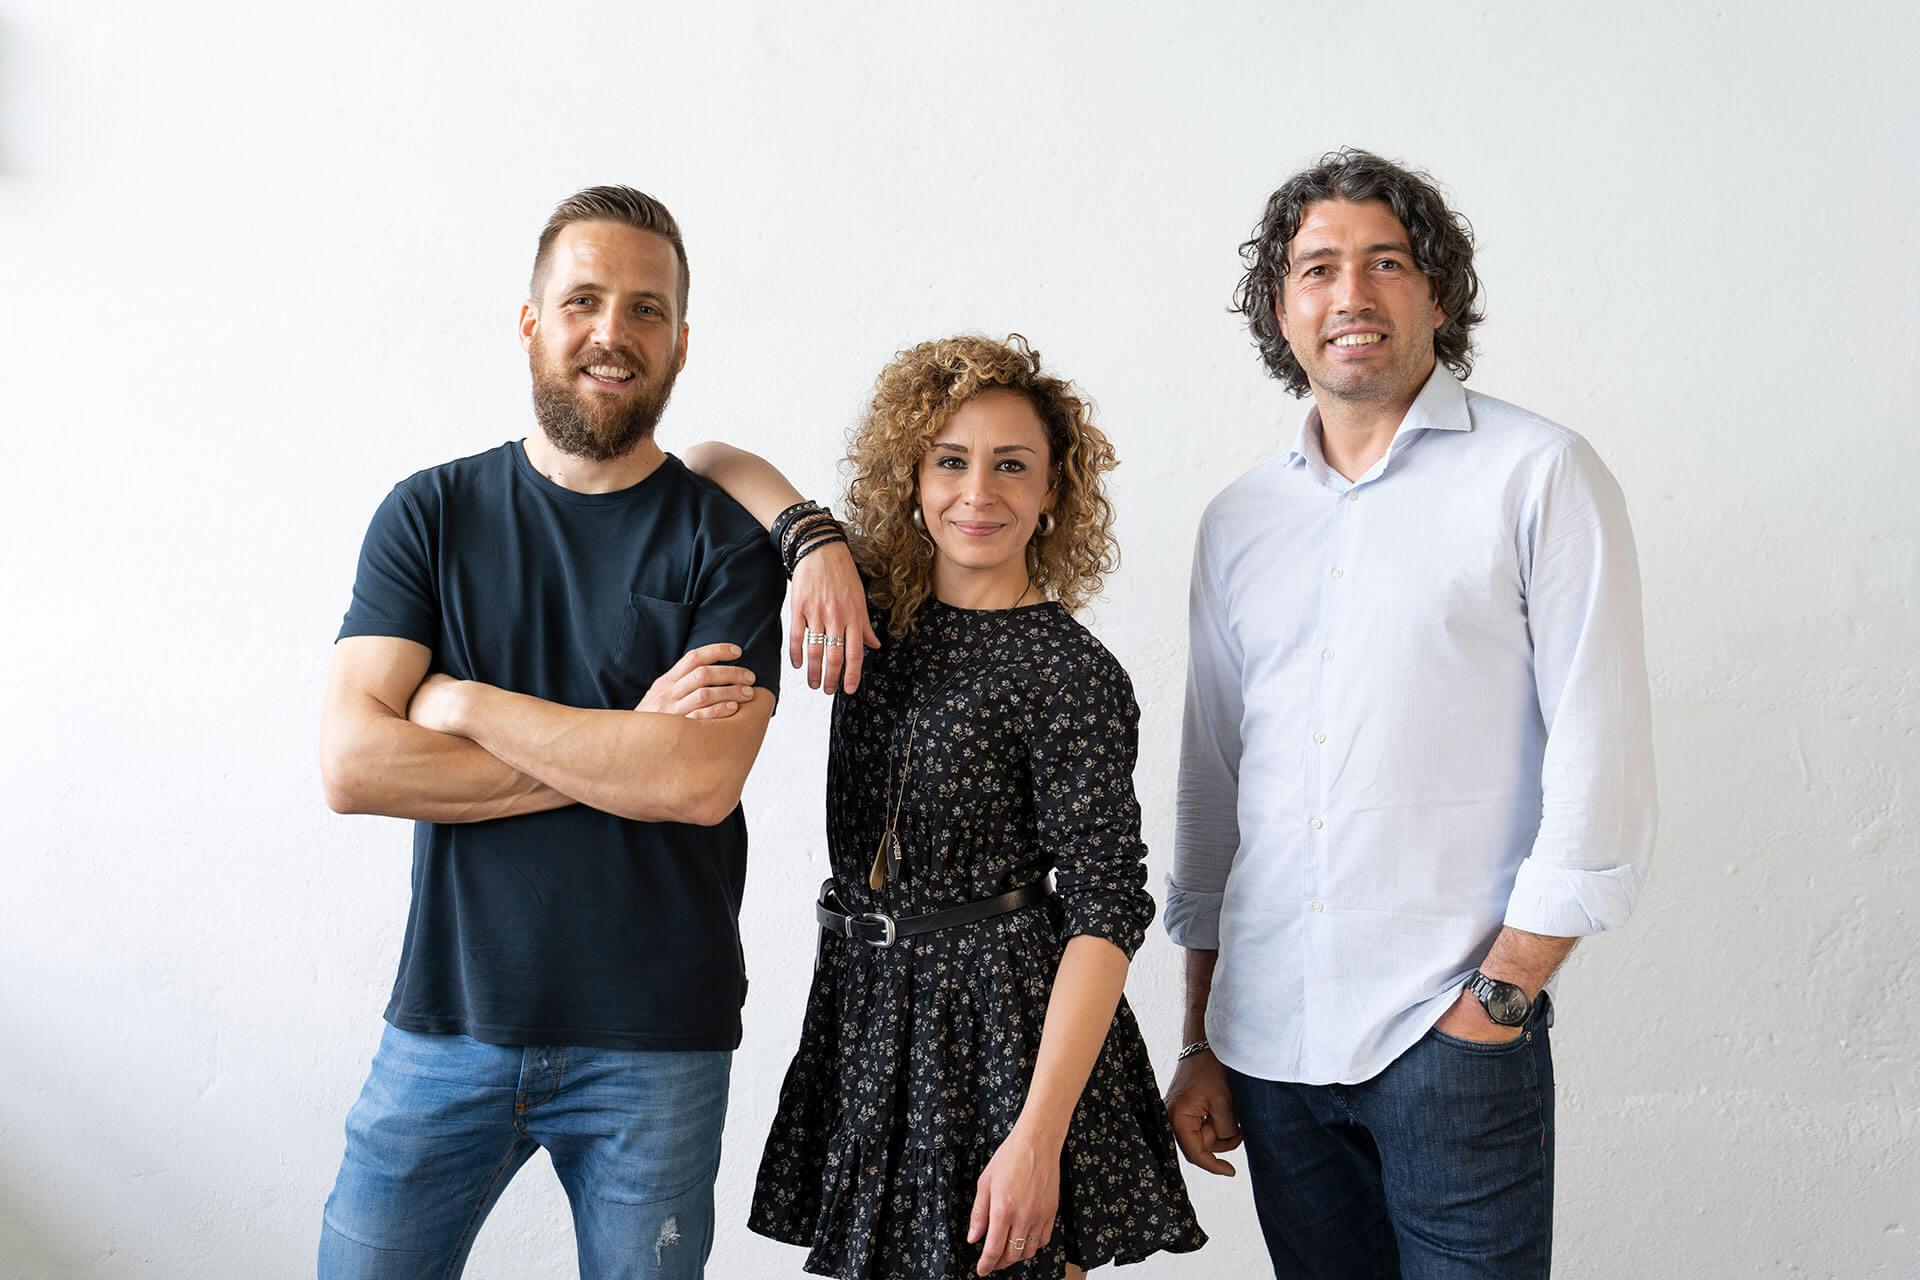 Aqualaguna - La Bottega degli Artigiani - Slides 5